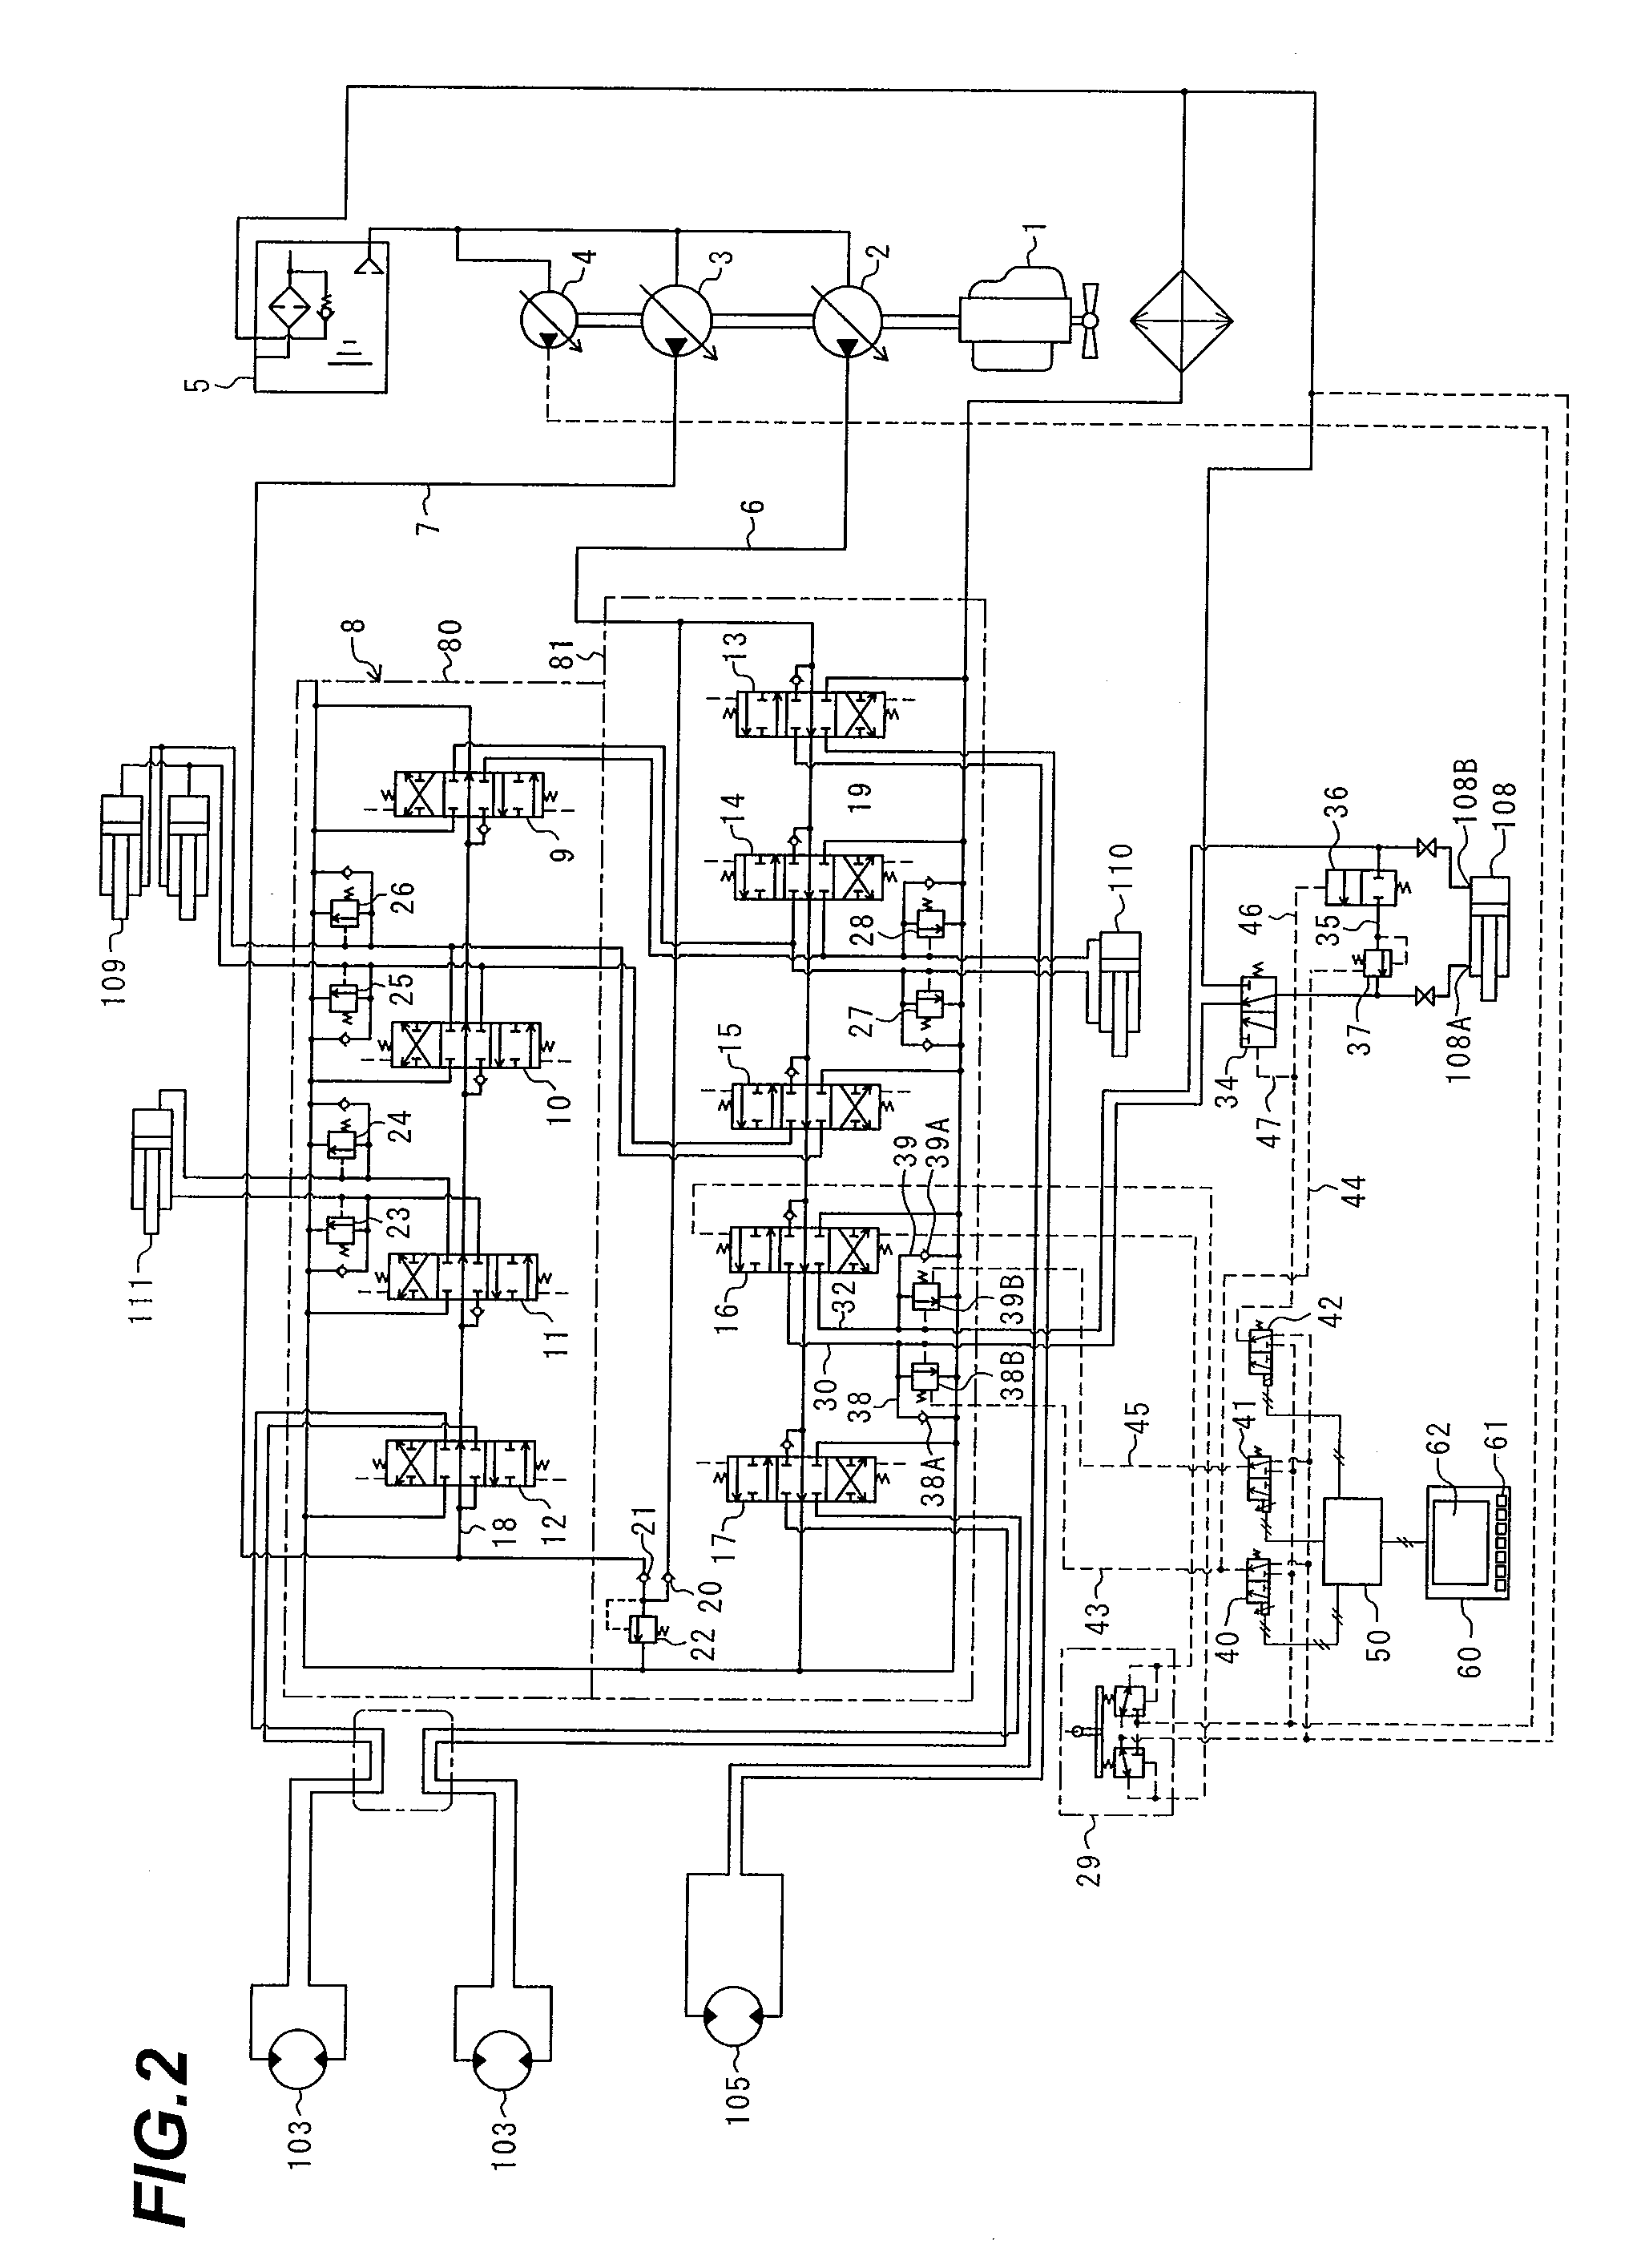 Patent US20110061755 - Hydraulic circuit system for hydraulic ... on hyundai 2.0 timing belt replacement, hyundai lights, hyundai repair manual, hyundai fuel system diagram, hyundai manual transmission, hyundai engine, hyundai timing marks, hyundai fuse box diagram, hyundai parts, hyundai battery, hyundai heater core replacement, hyundai radio wiring, hyundai suspension, hyundai awd system, hyundai headlight adjustment, hyundai automatic transmissions, hyundai dealer locator us, hyundai torque specifications, hyundai warranty, hyundai maintenance schedule,